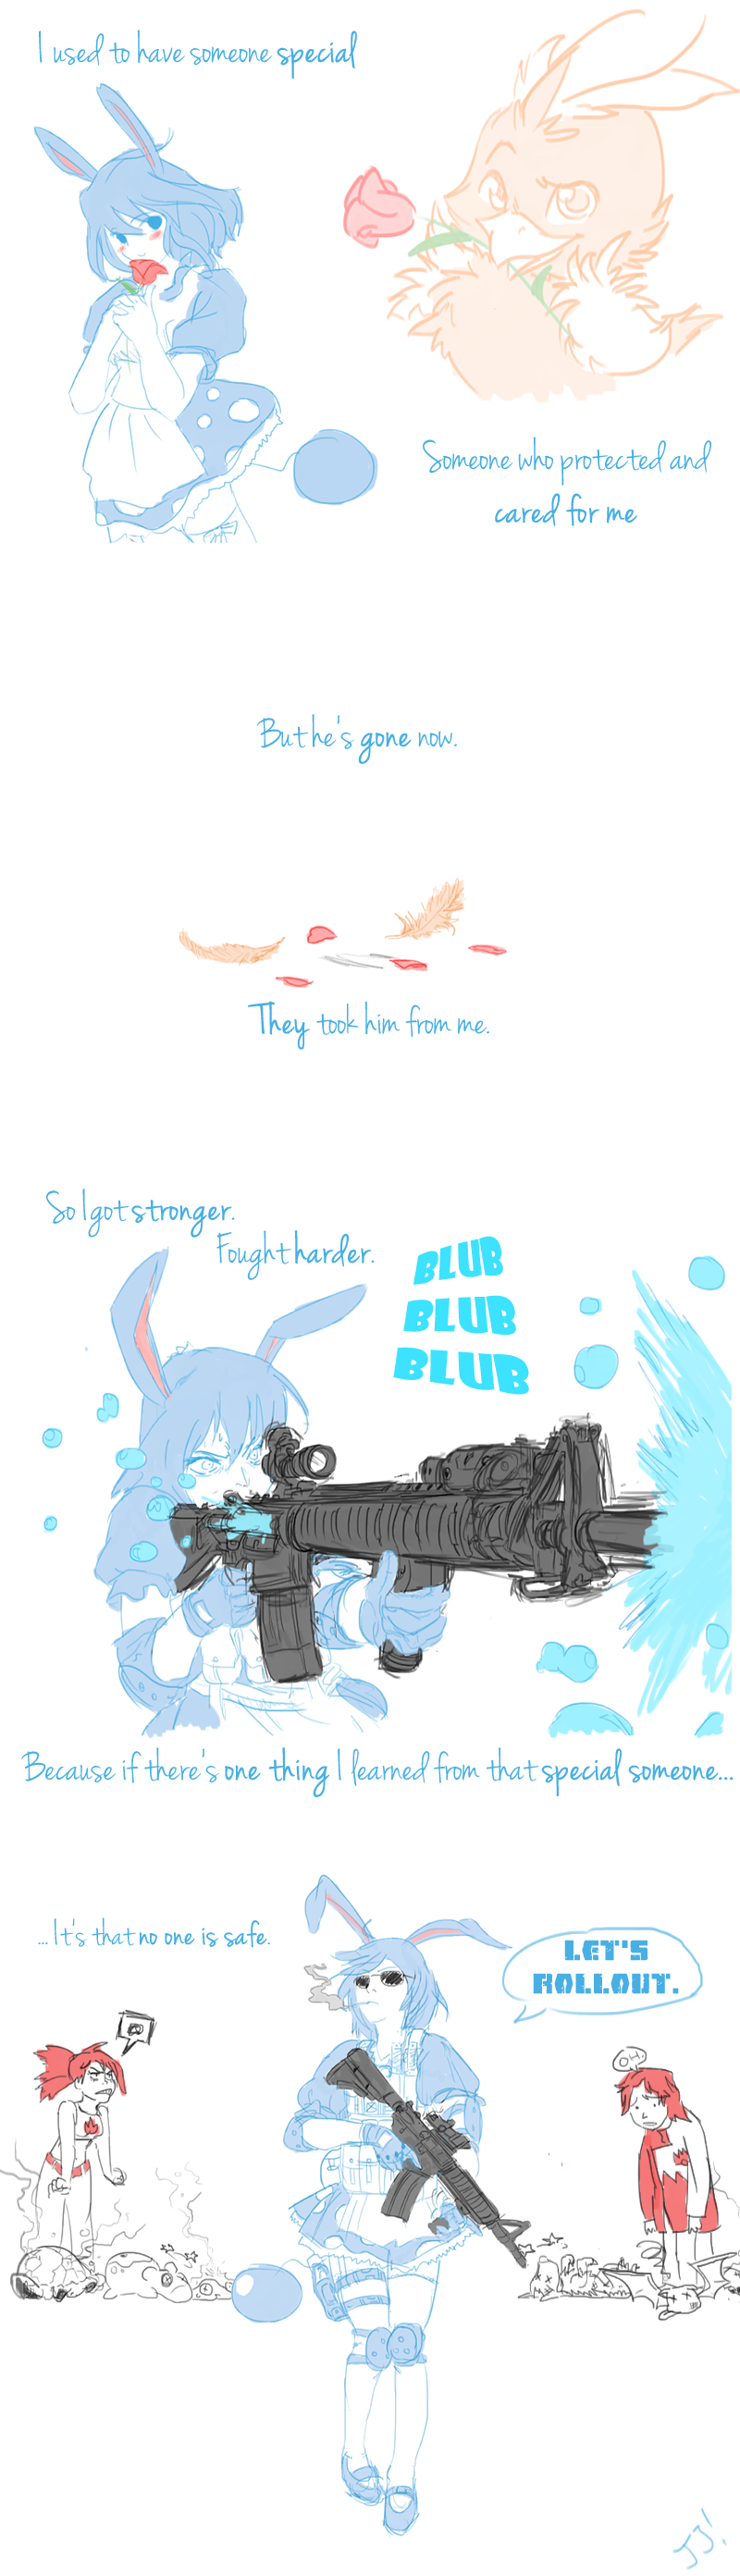 absurdres animal_ears asuna_(pokemon) azumarill blue_hair bubble english flower golbat highres jjgriffin mightyena numel personification pokemon rabbit_ears redhead rose slugma sunglasses tactical_clothes torchic torkoal twitch_plays_pokemon weapon